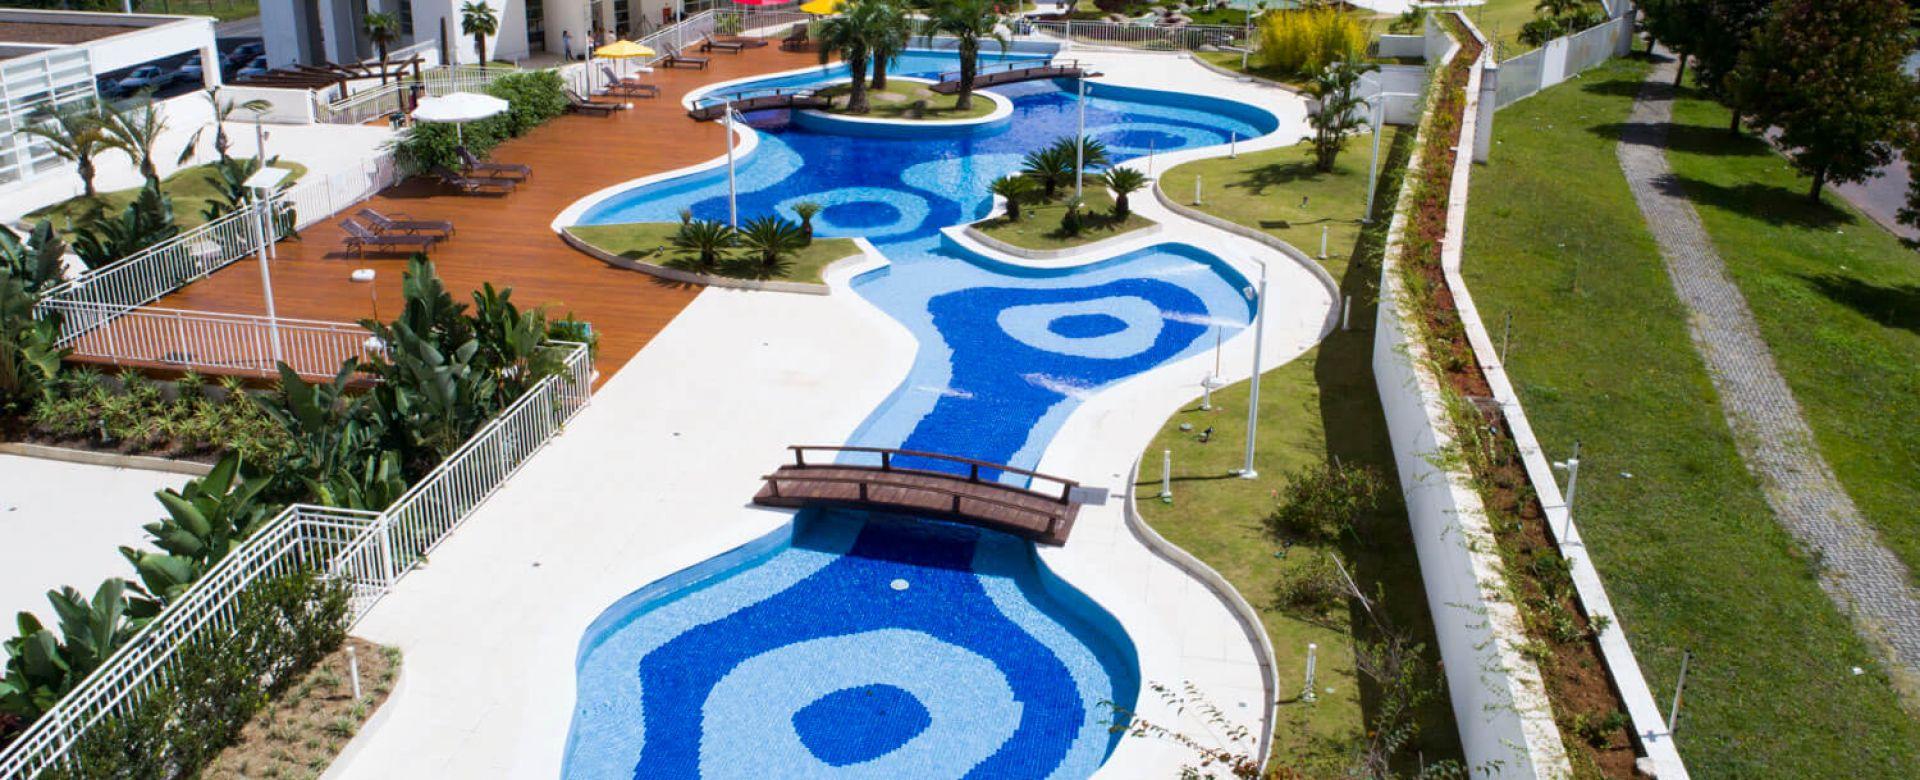 Parque Ecoville - Torre Barigui, foto 1